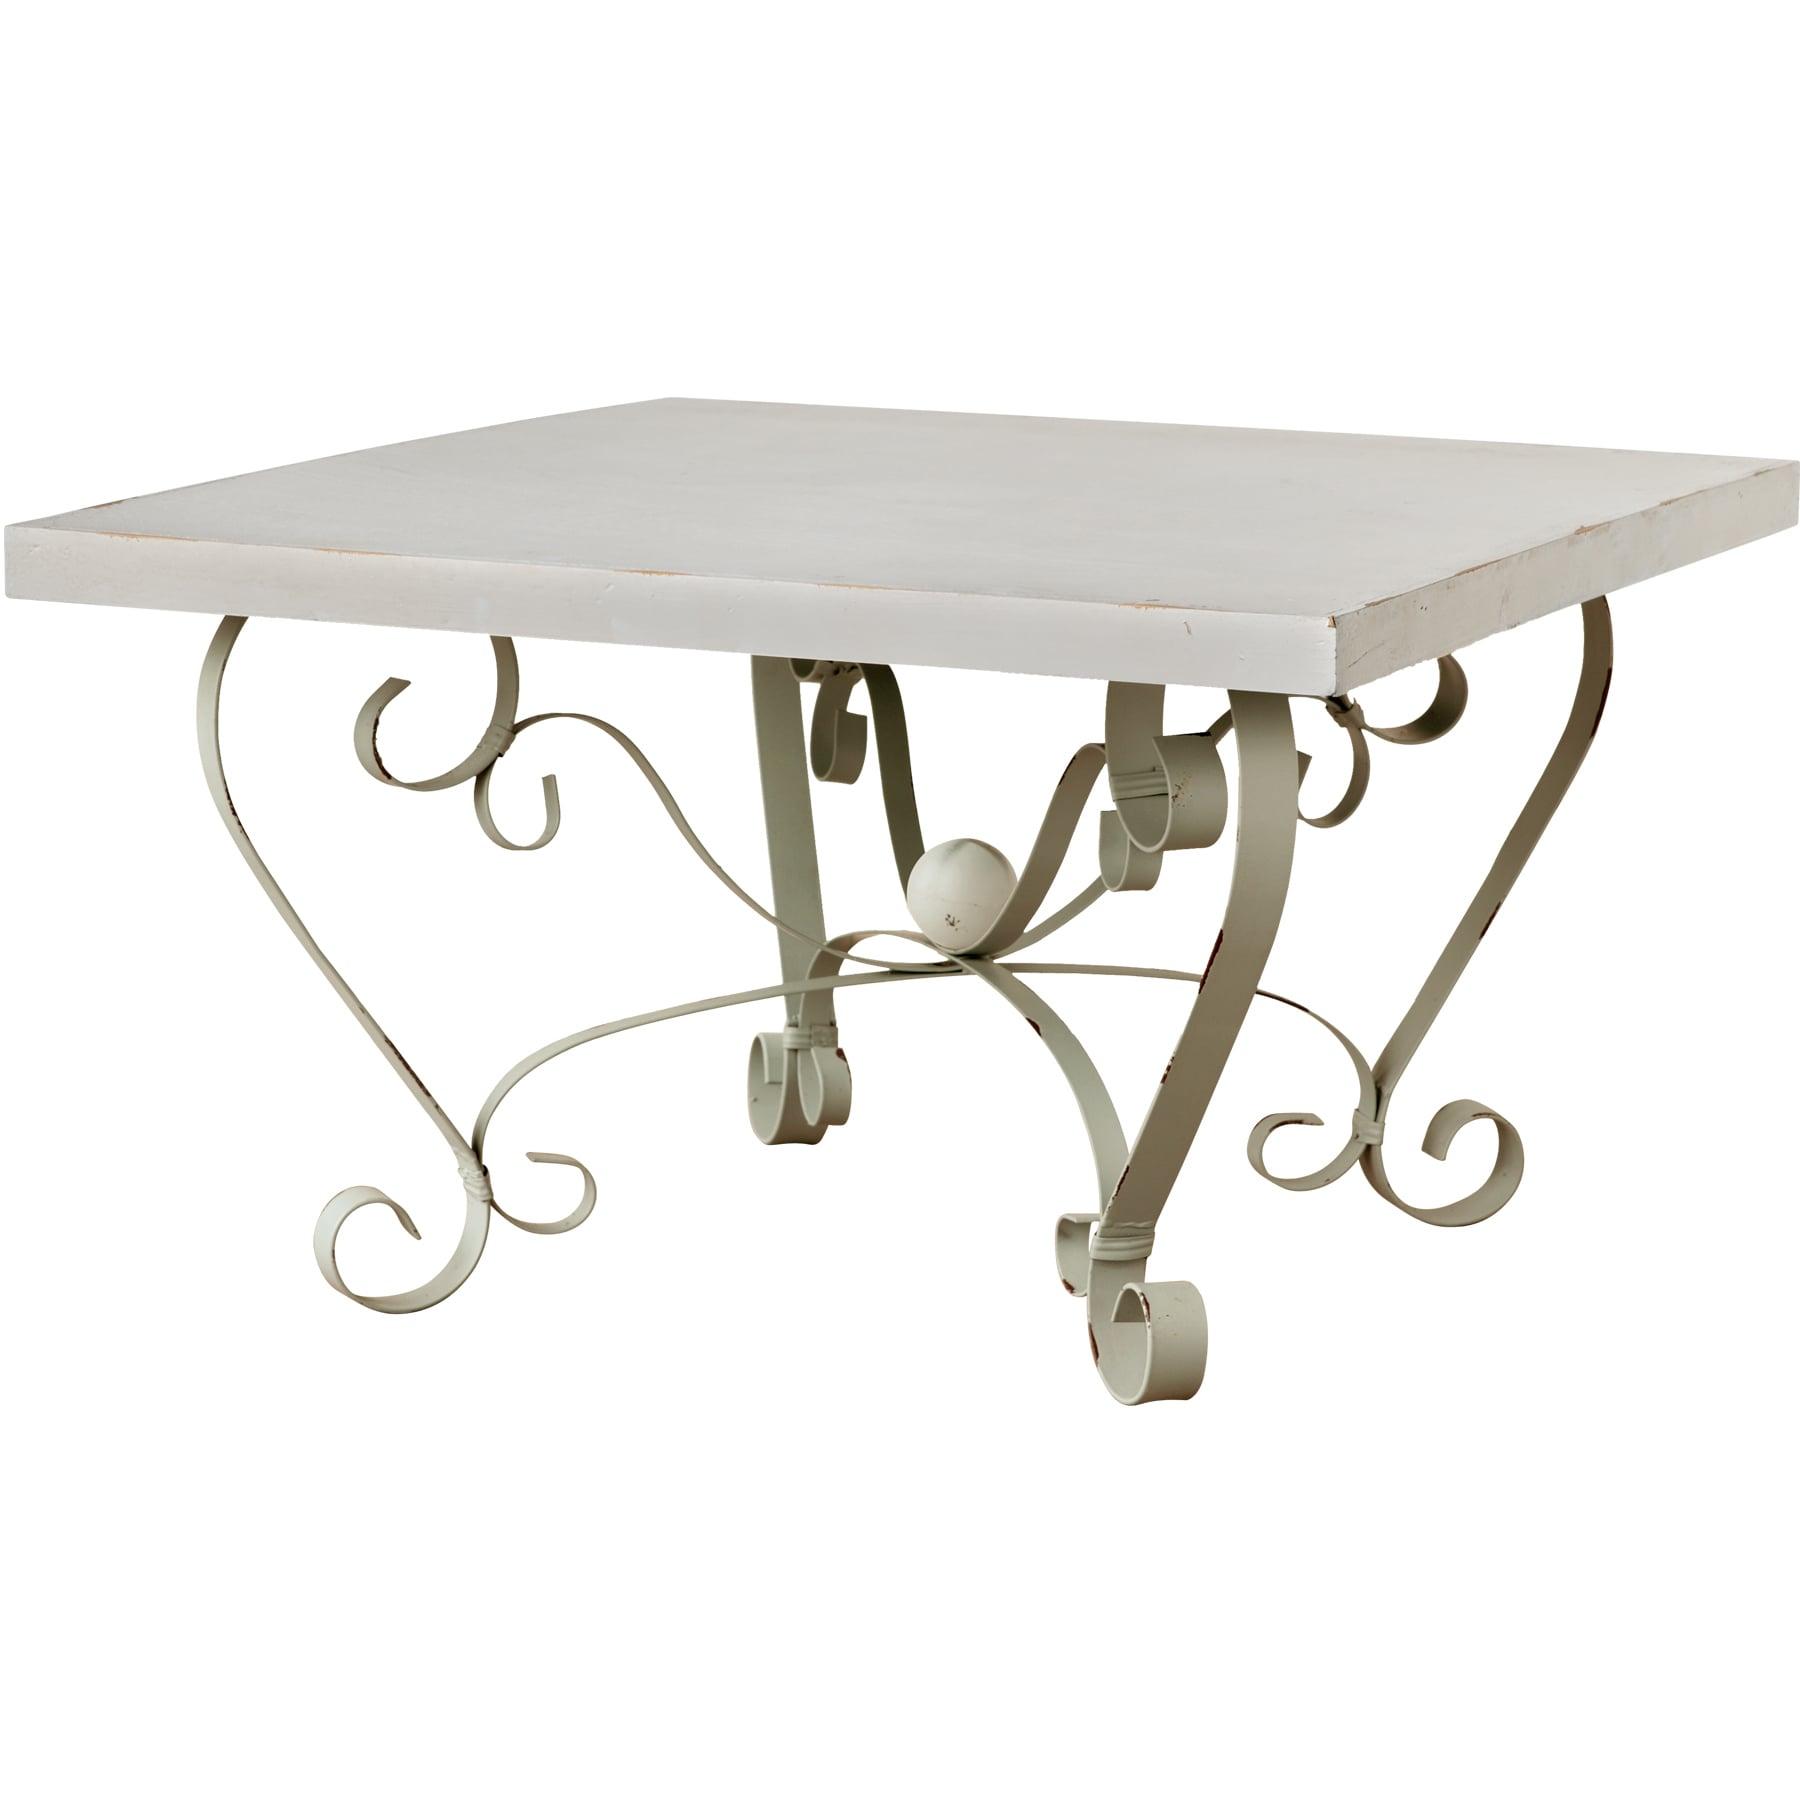 "St. John Metal/ Stone Table (35.5x35.5x22"" Coffee Table),..."